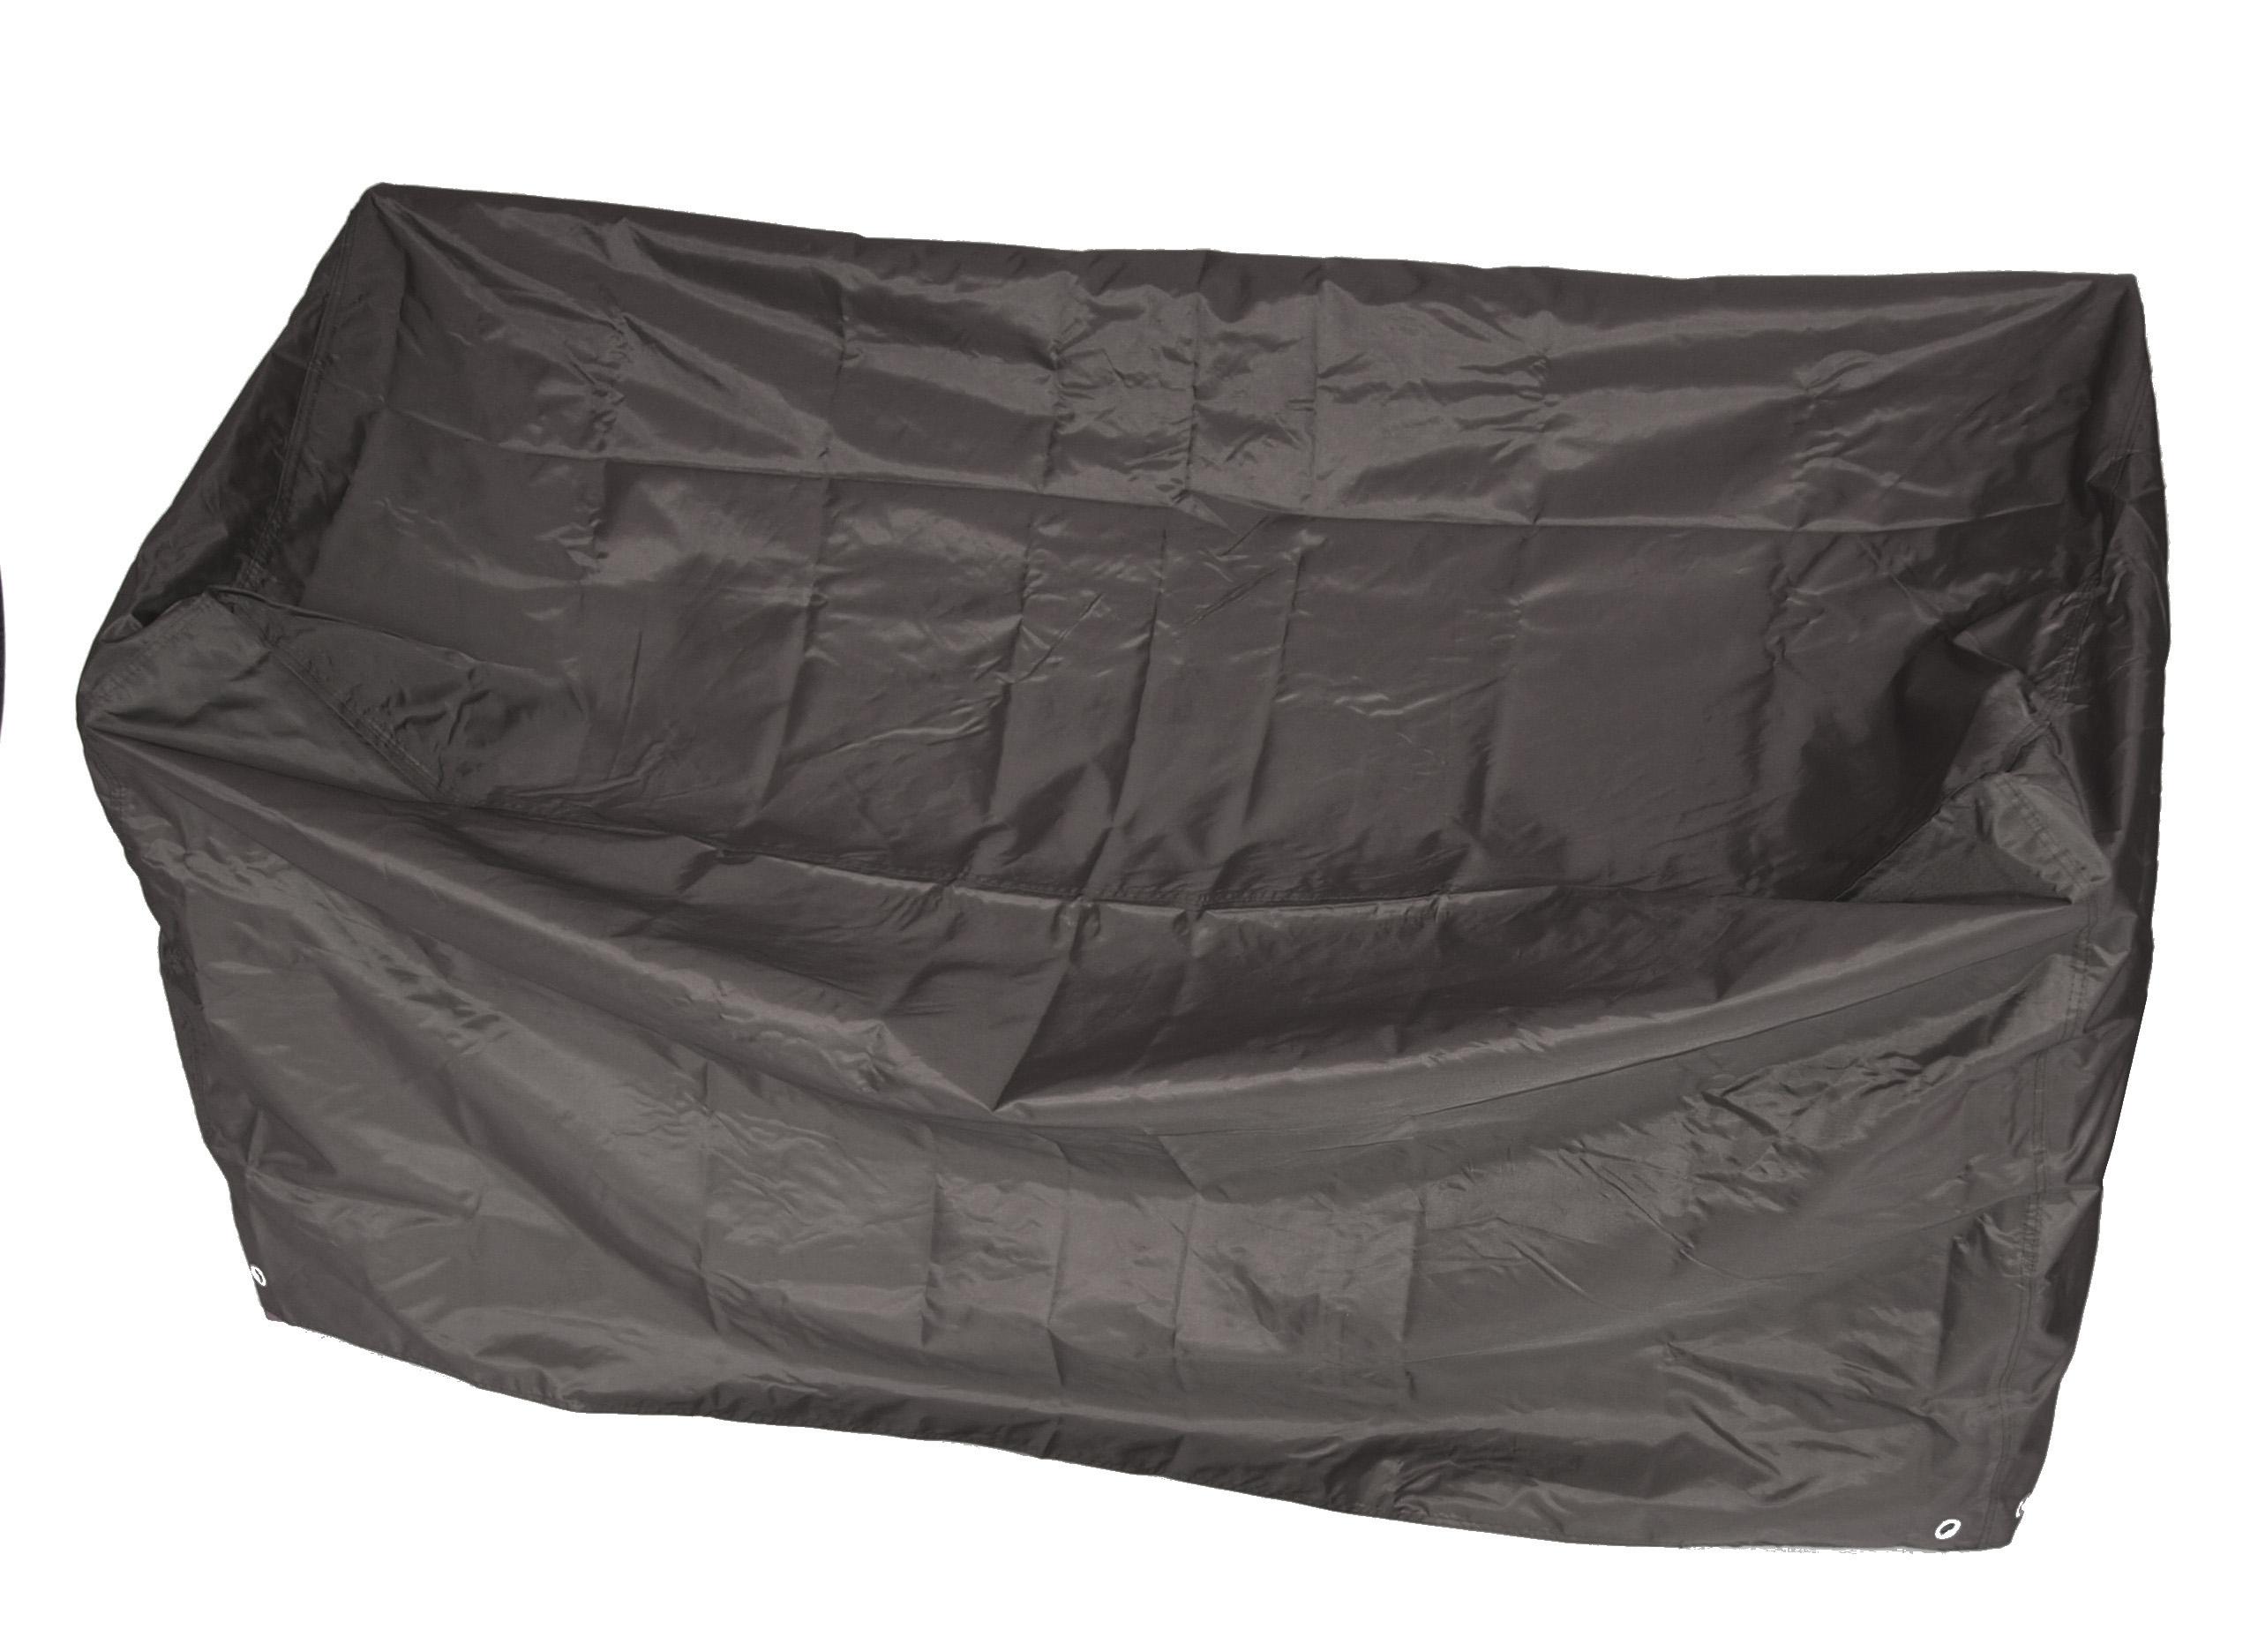 Abdeckhaube Bank 2-sitzer 134cm, Polyester PE-beschichtet grau